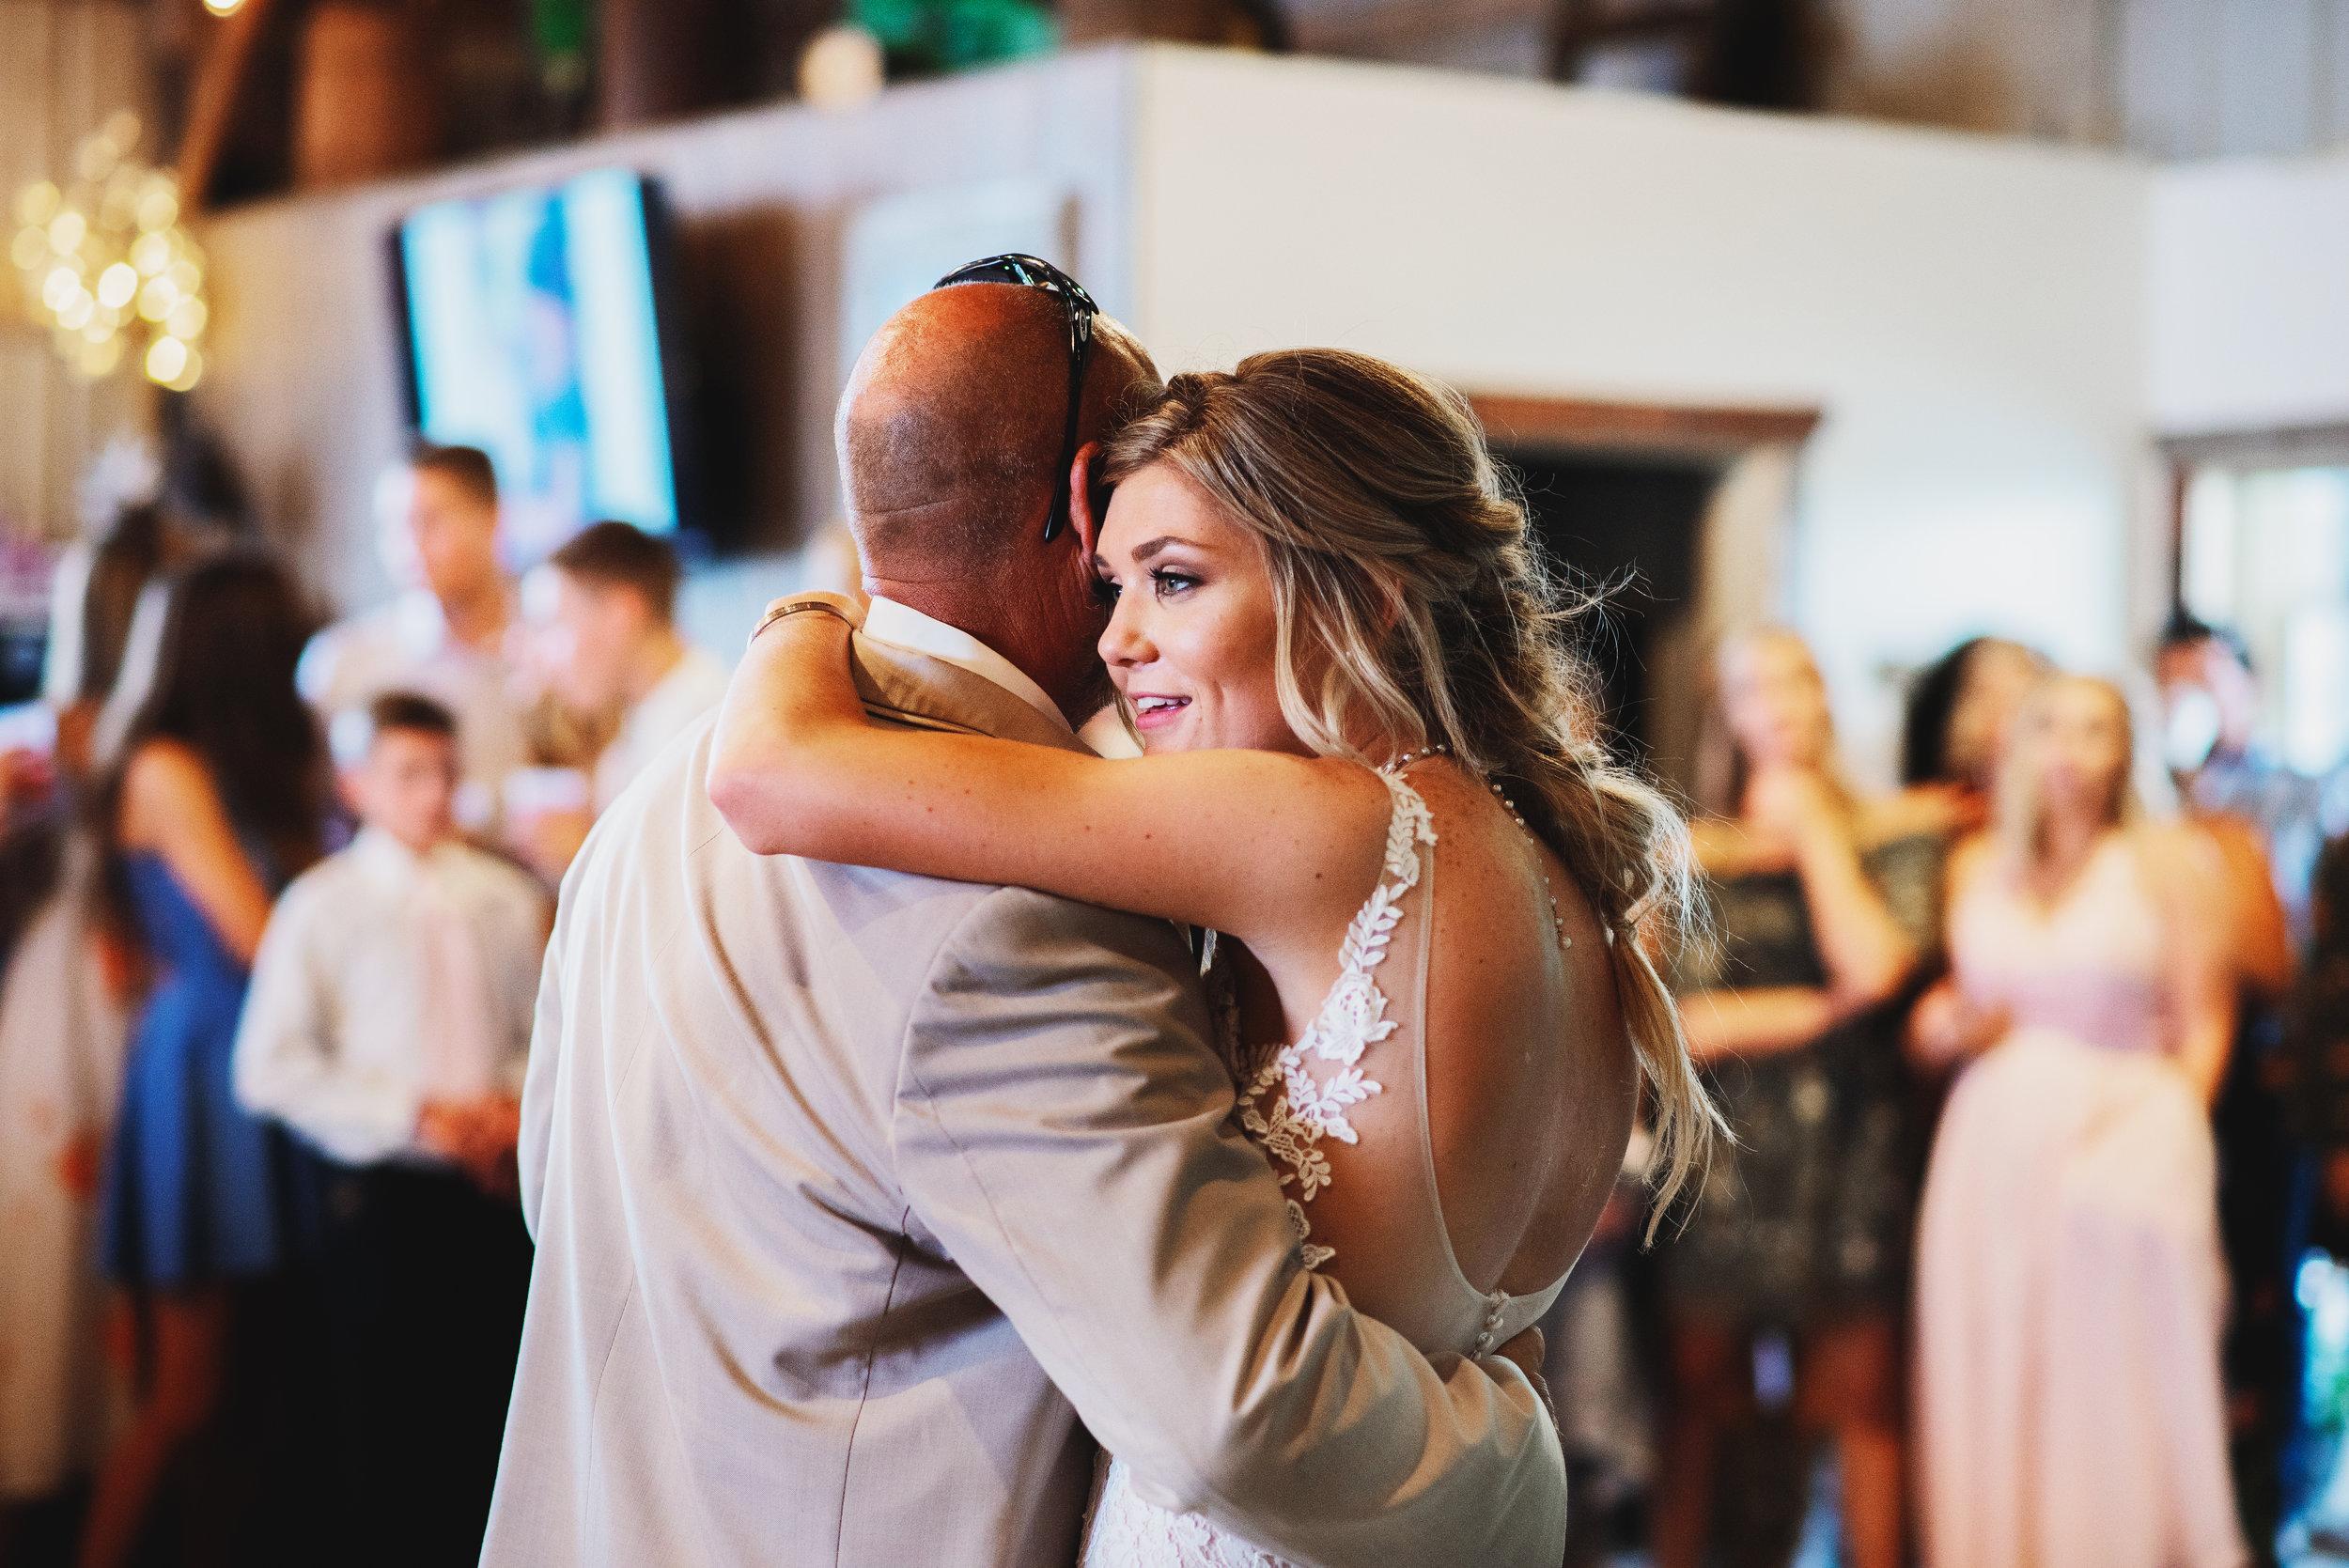 Risley-Reception-First Dances_0027.jpg